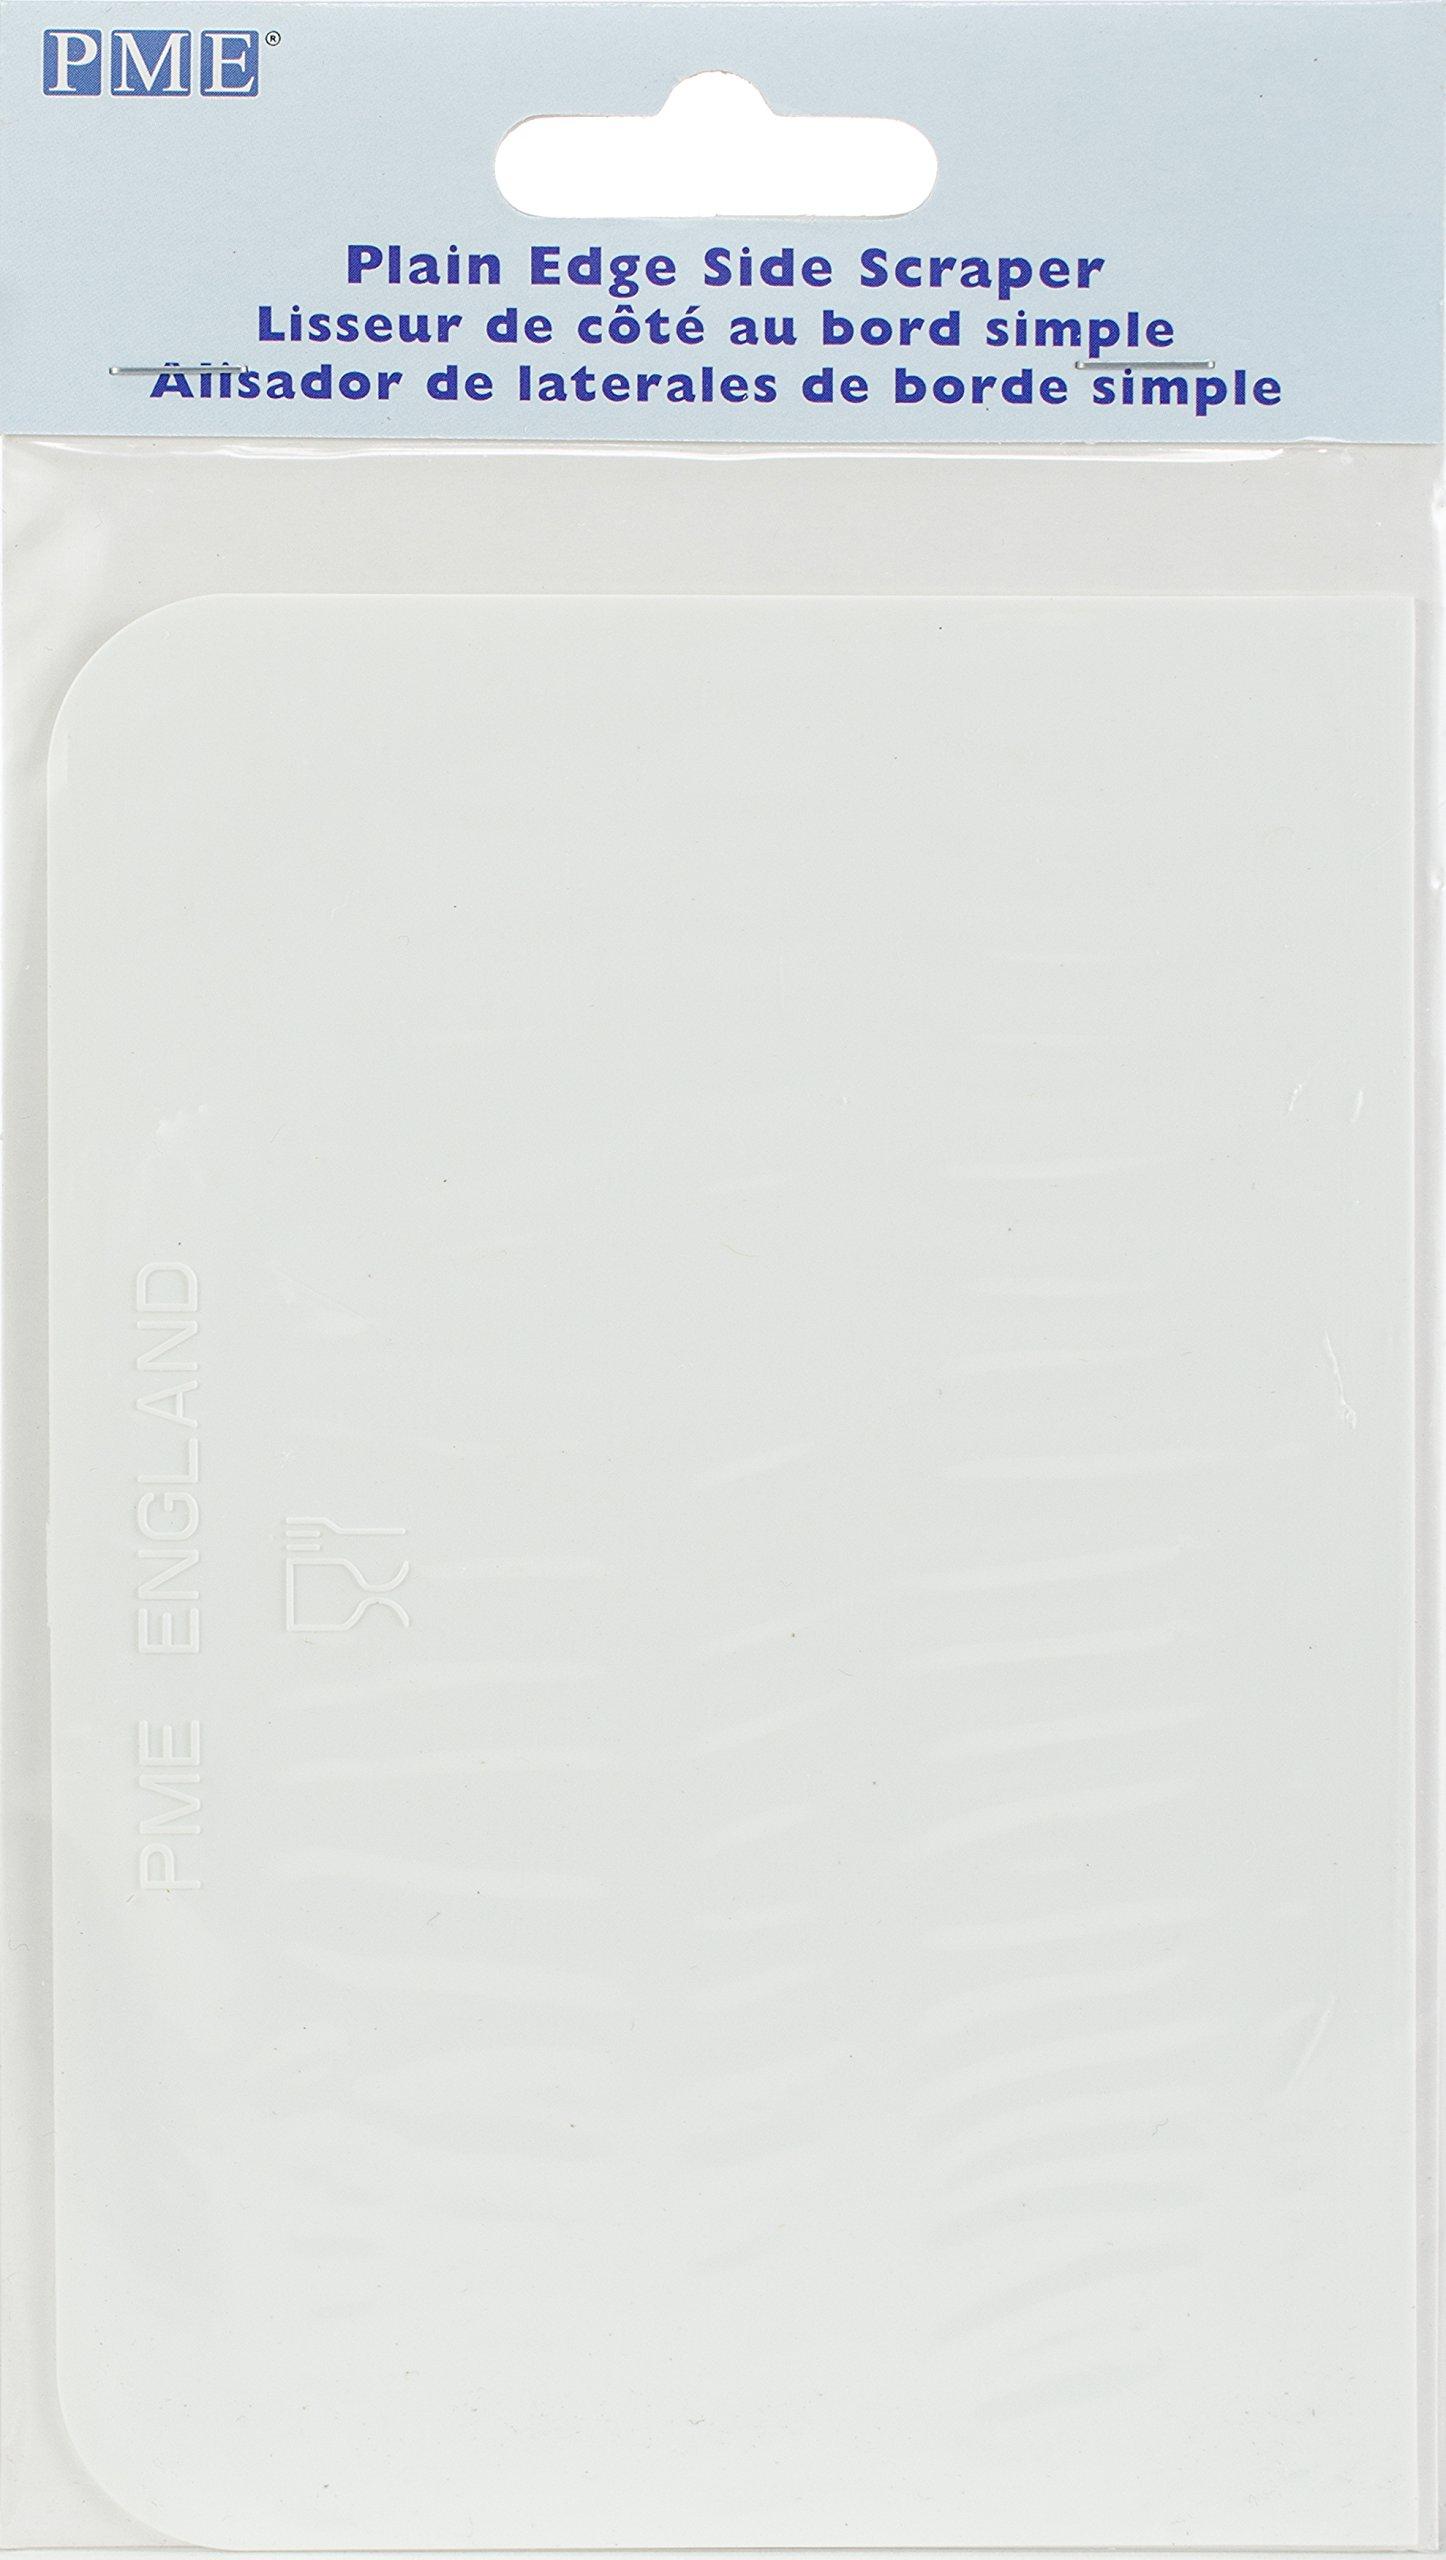 PME PS40 Plain Edge Side Scraper White